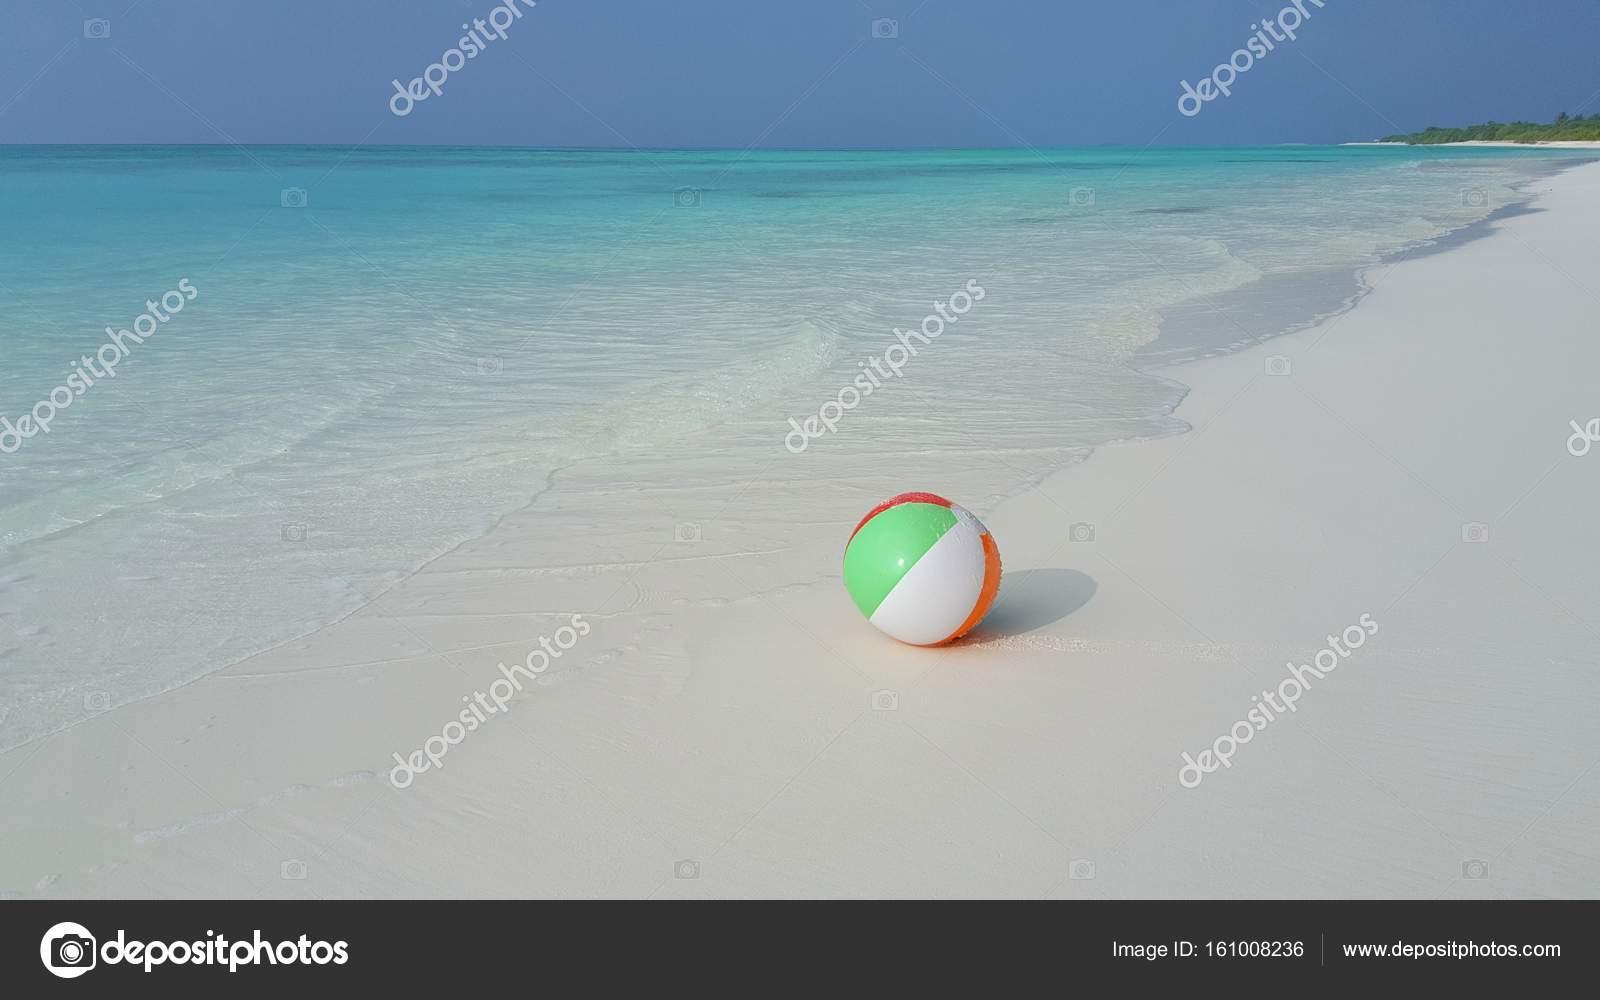 Beach ball in ocean Sand P00263 Maldives White Sandy Beach Ball On Sunny Tropical Paradise Island With Aqua Blue Sky Sea Maryland Coast Dispatch P00263 Maldives White Sandy Beach Ball On Sunny Tropical Paradise